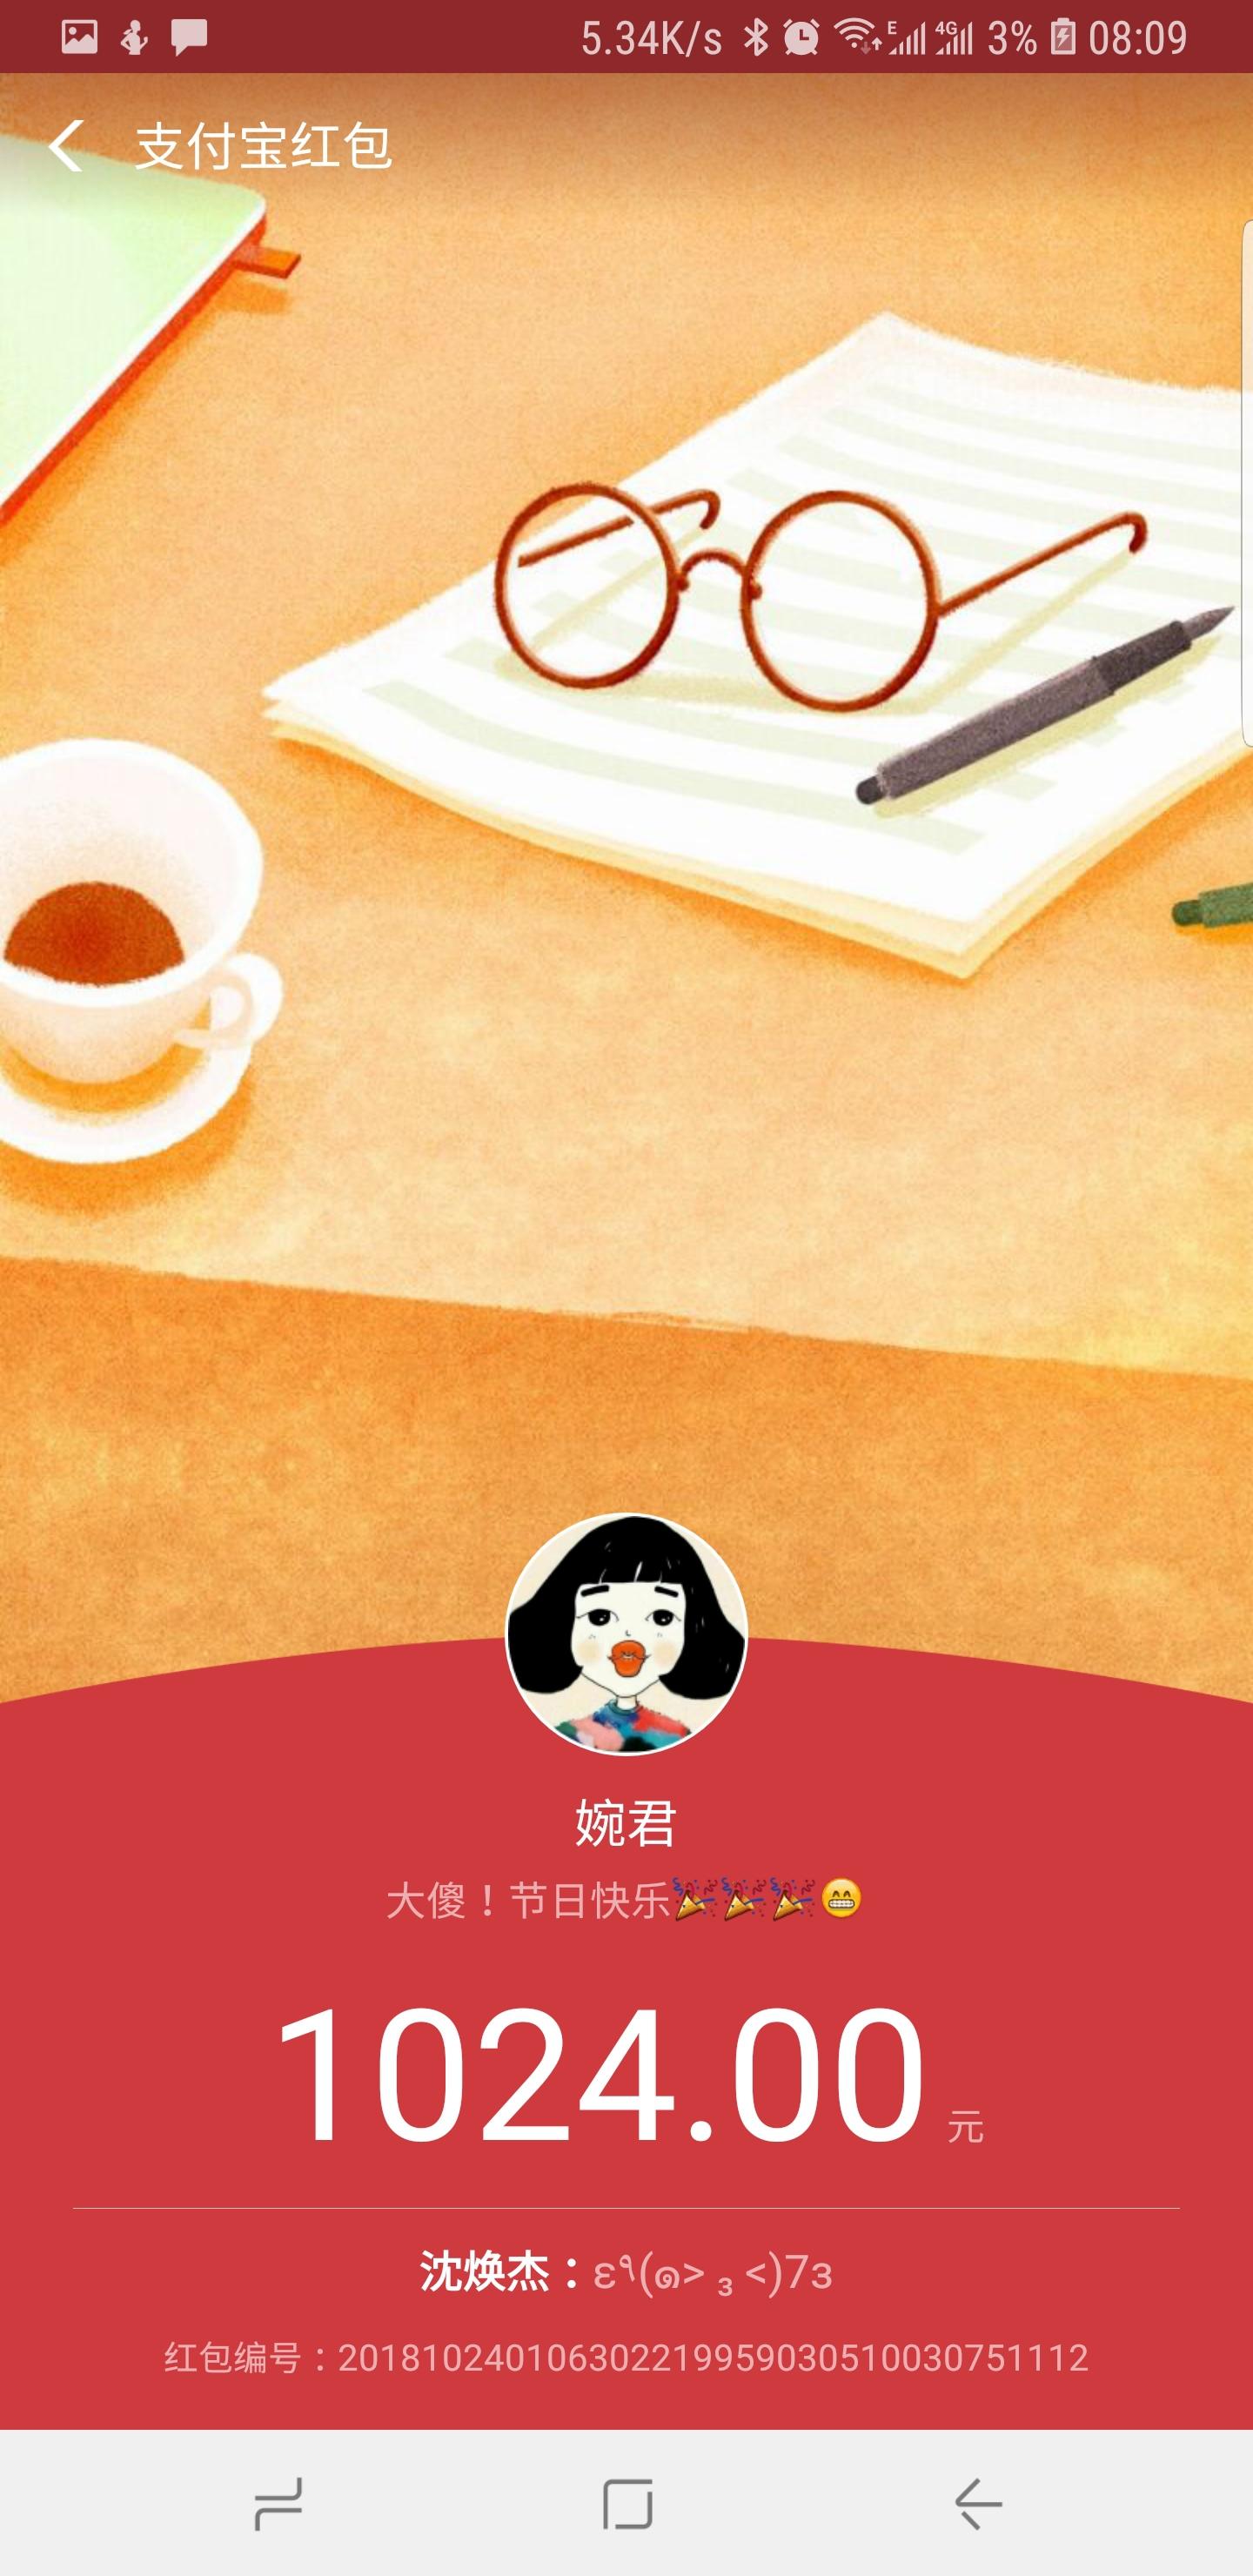 Screenshot_20181025-080936_Alipay.jpg